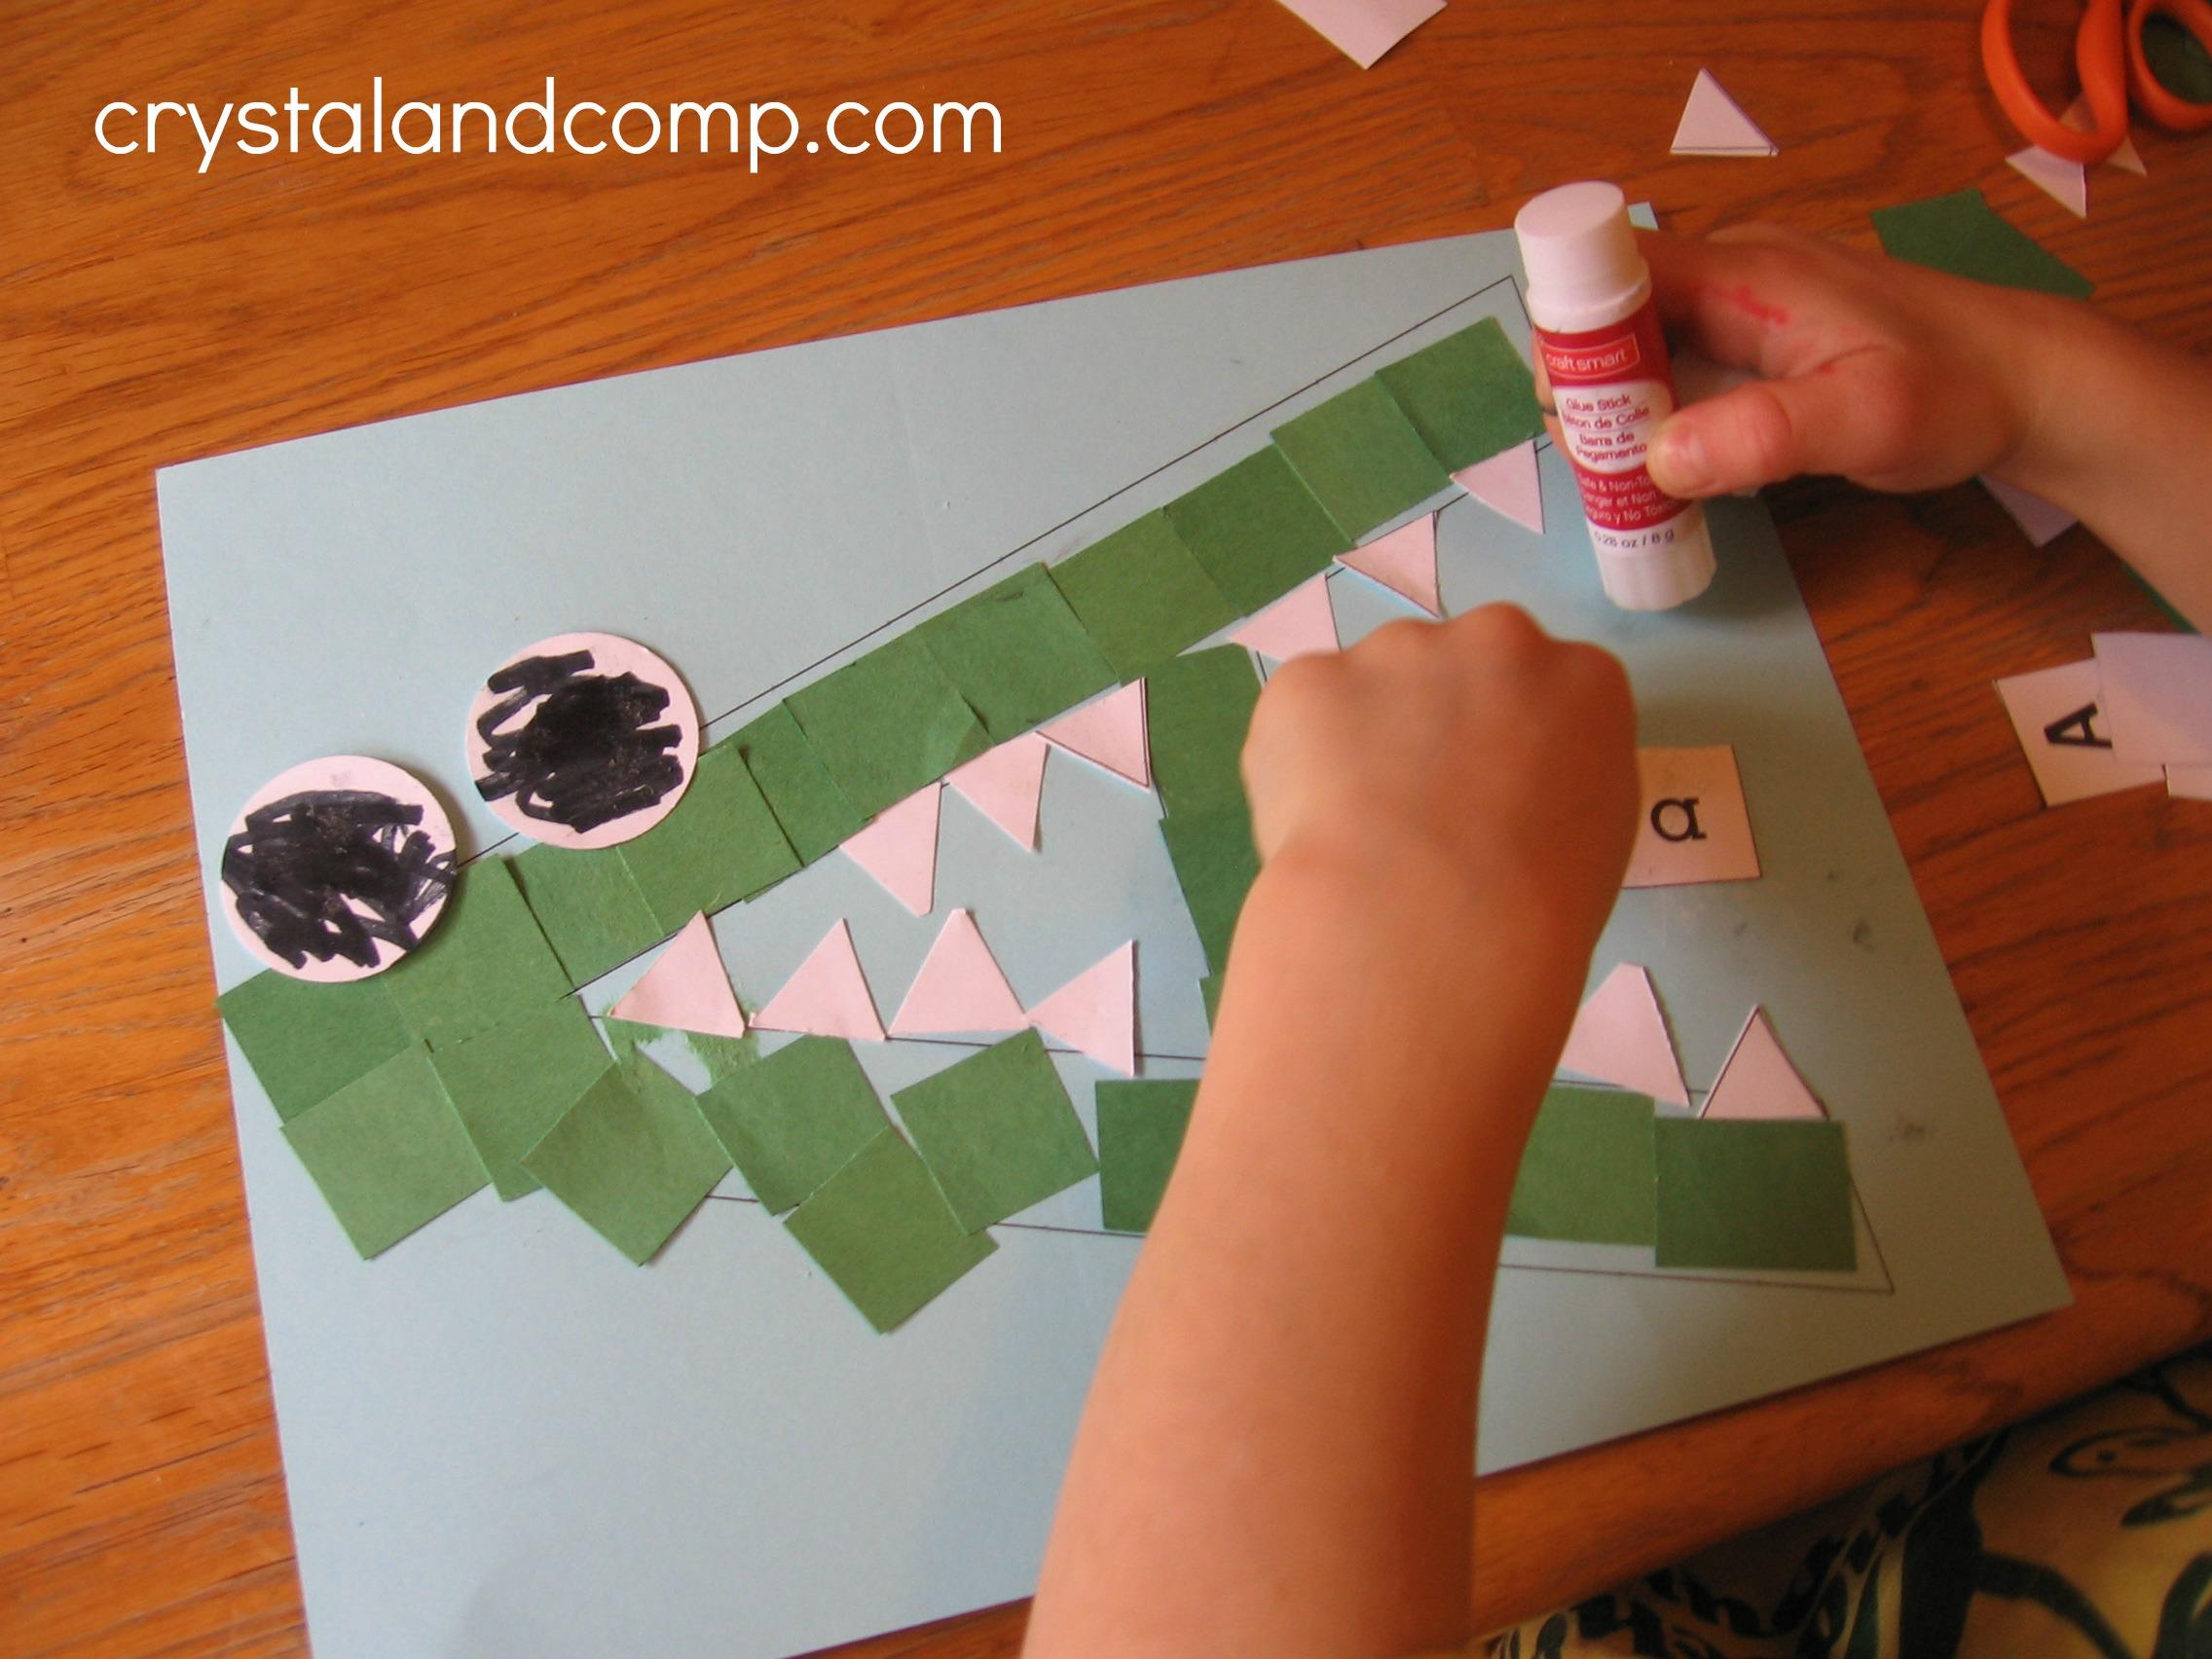 Pre k arts and crafts - A Is For Alligator Preschool Craft 9 Crystalandcomp